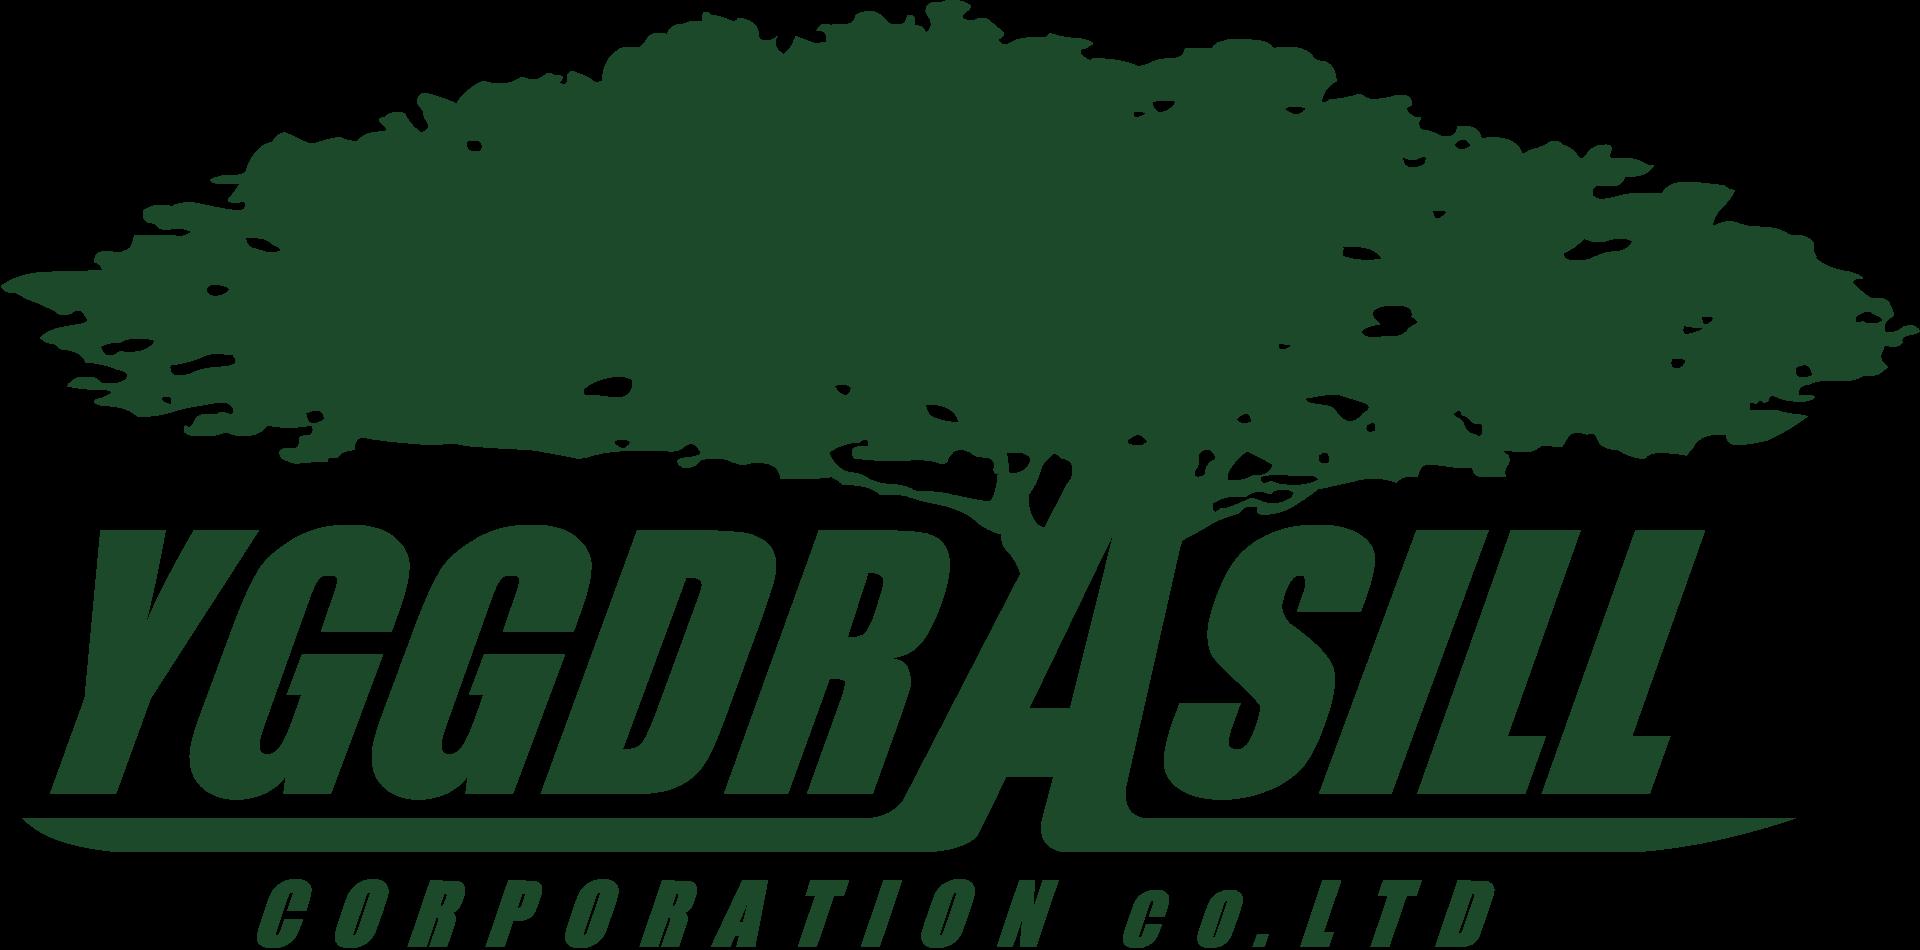 Yggdrasill Corporation